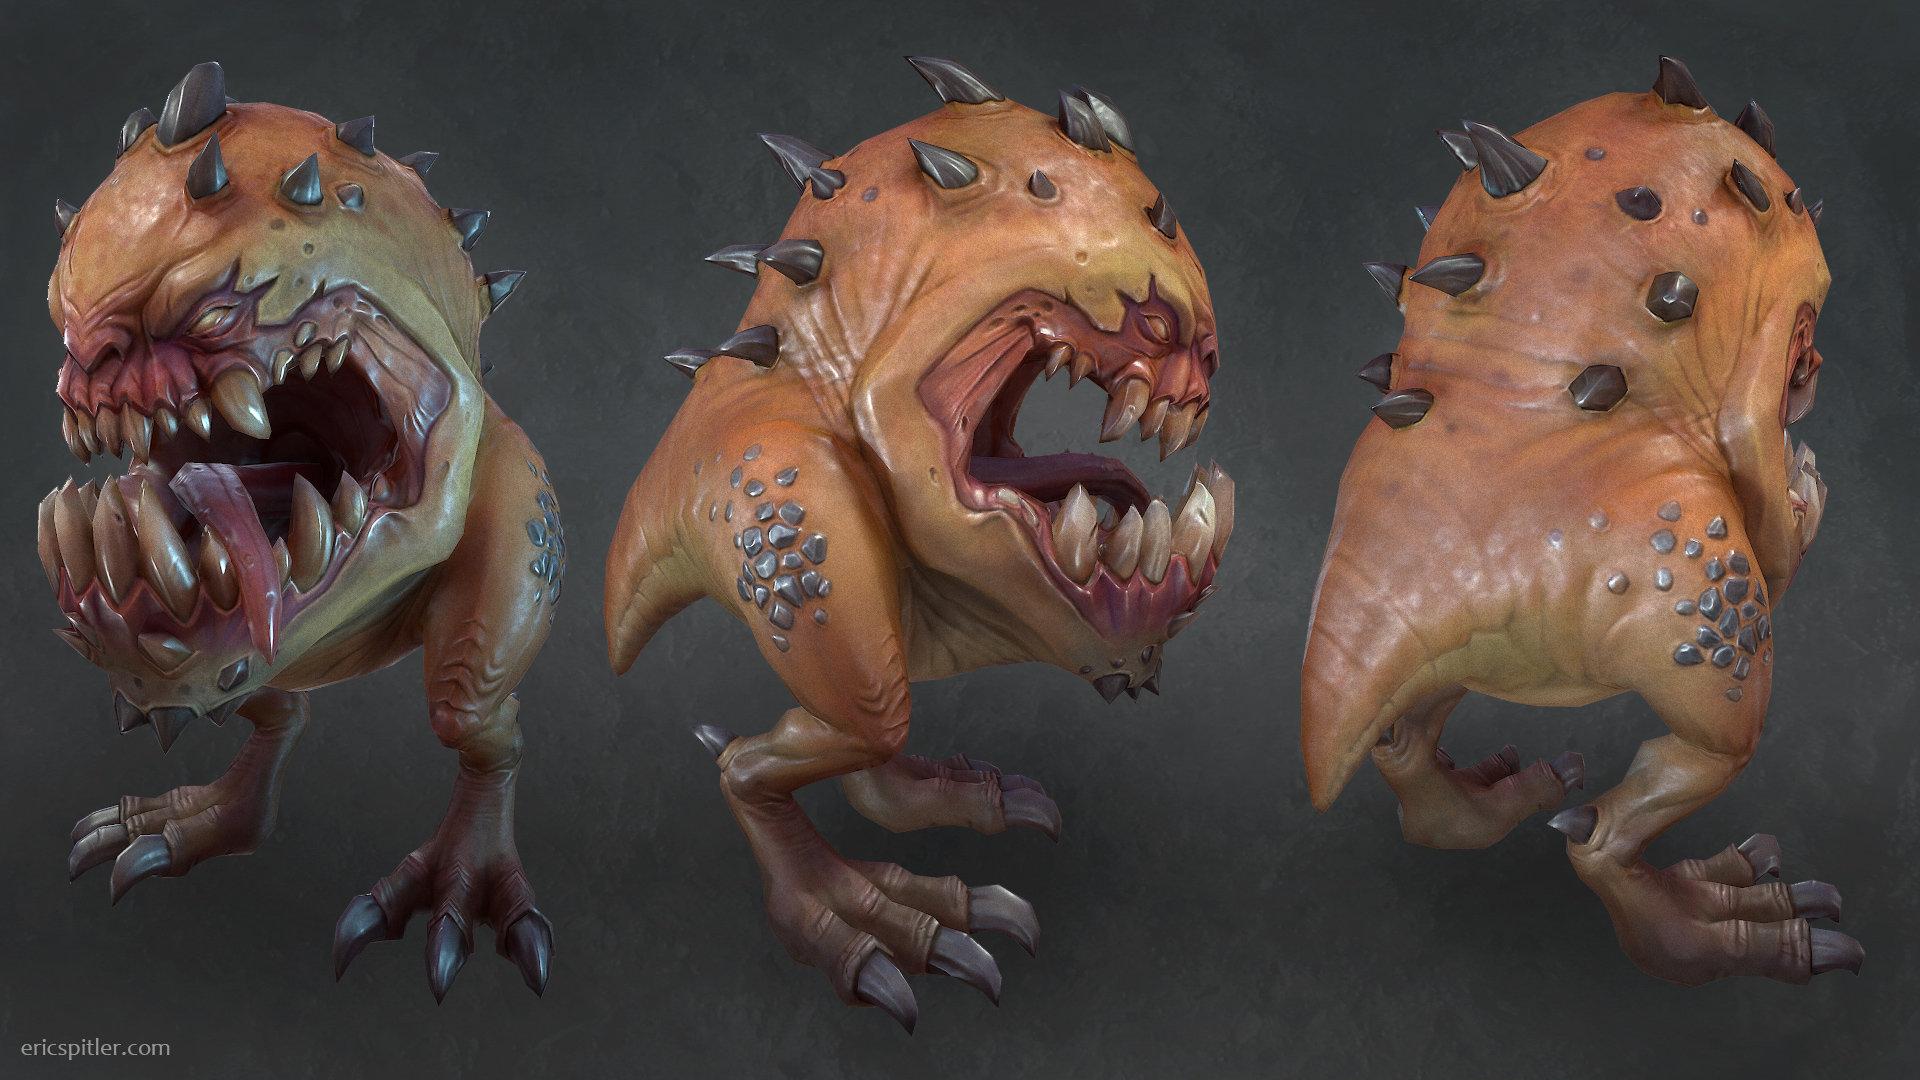 3d monster pics hentia pic